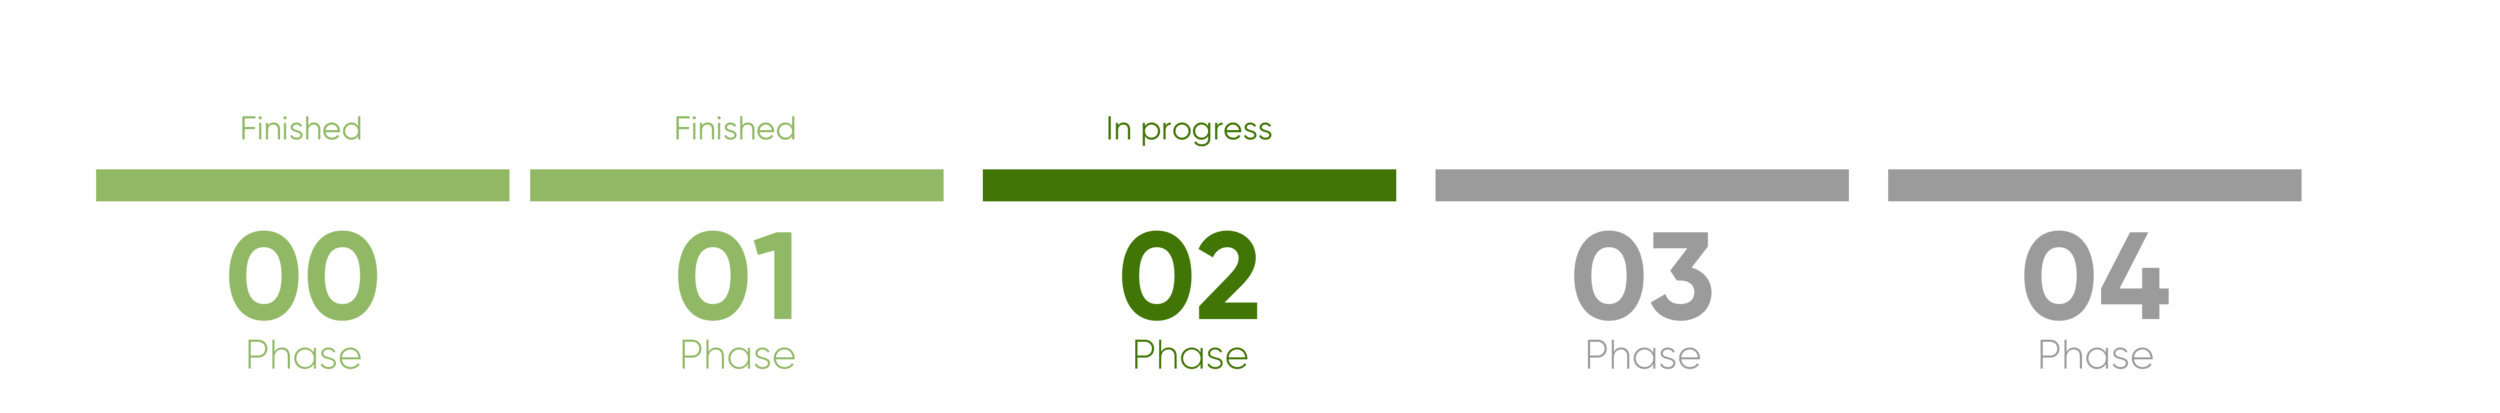 Process-timeline.png